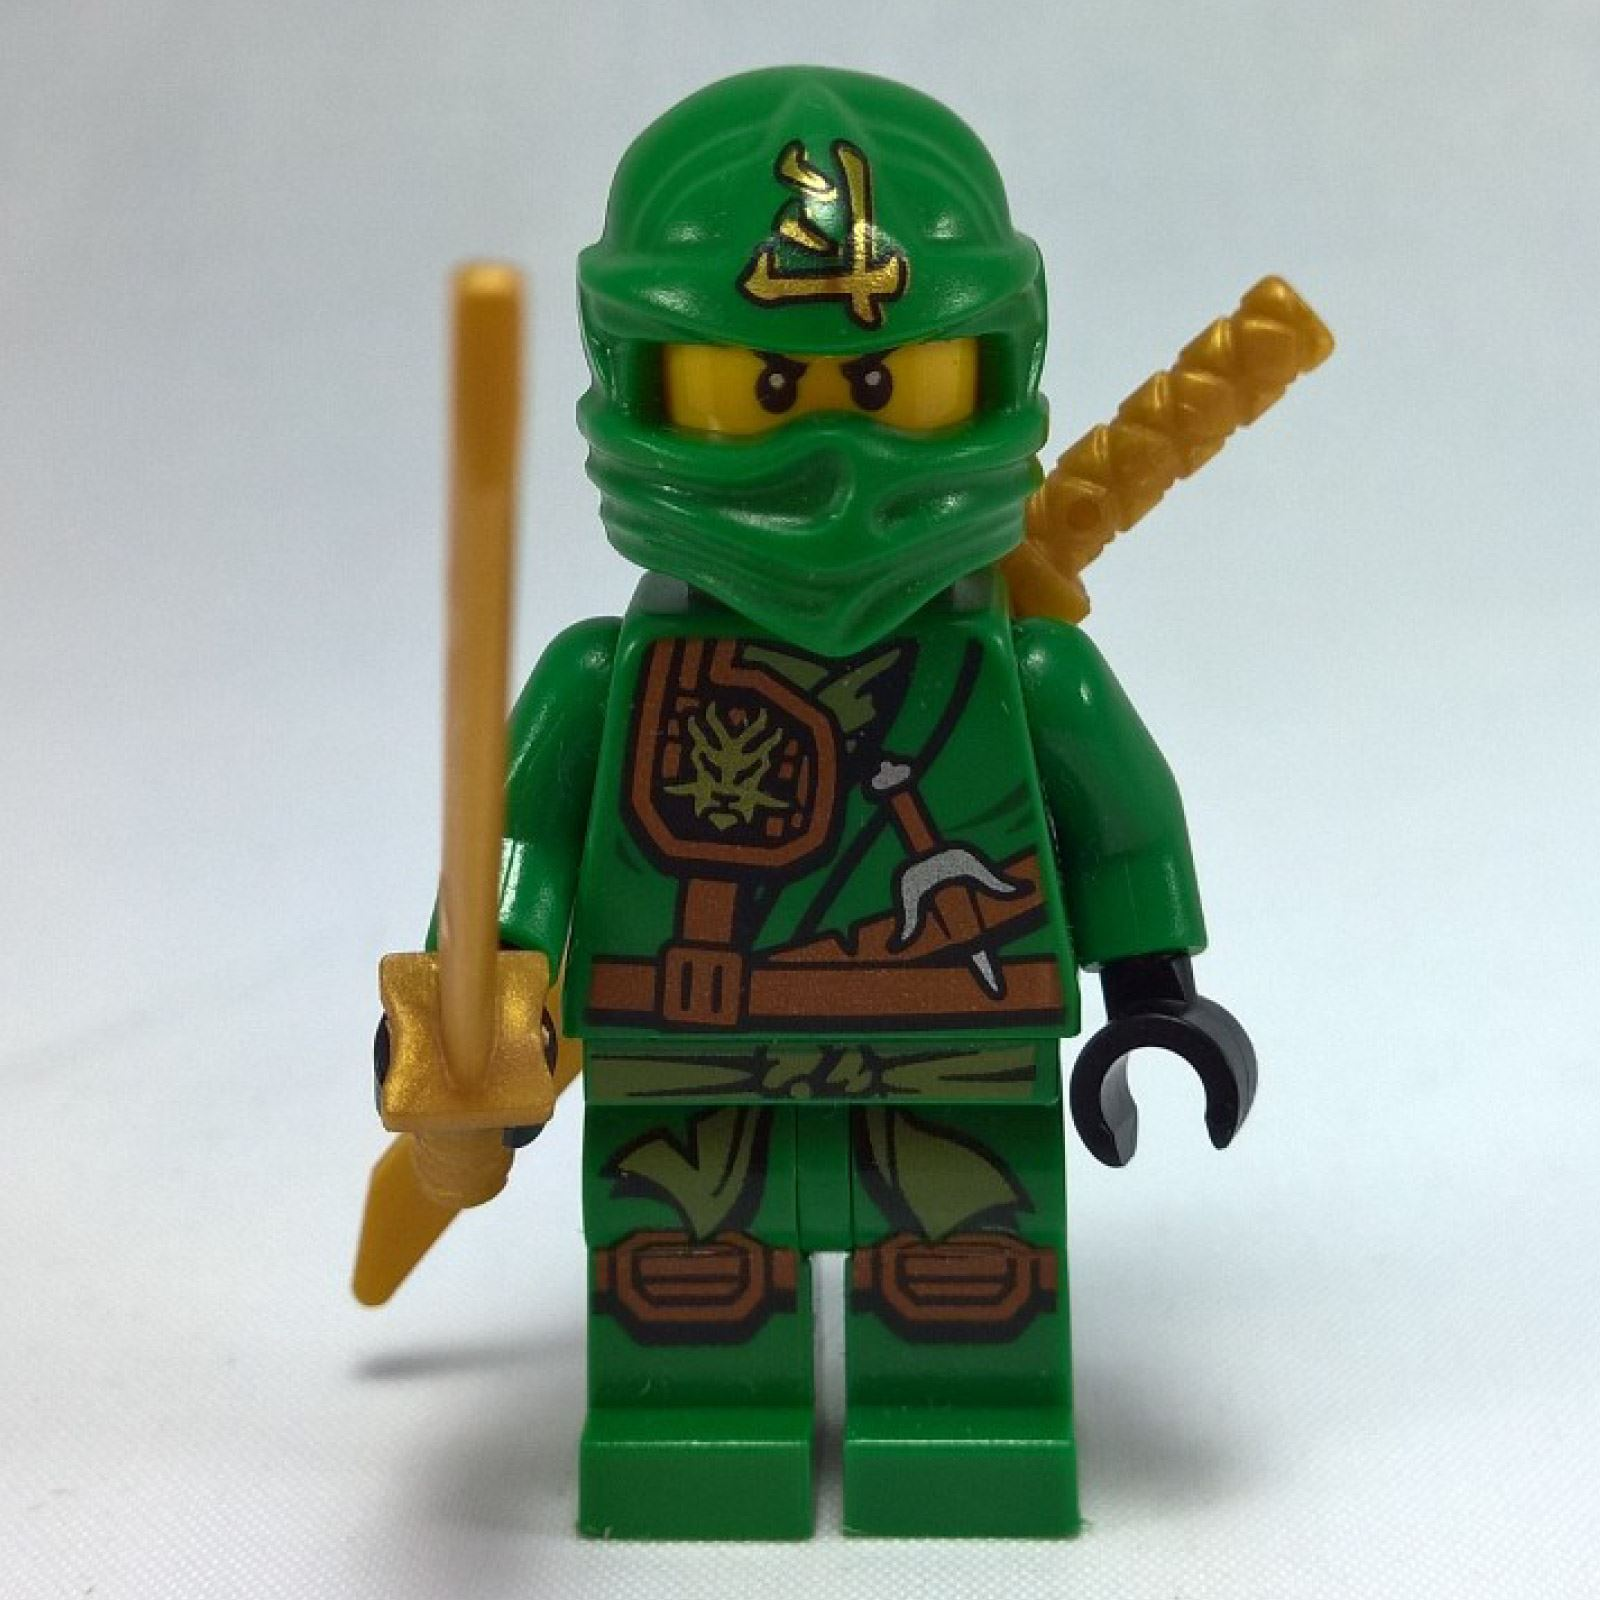 Lego njo ninjago masters heroes sensei ninja robots - Sensei ninjago ...